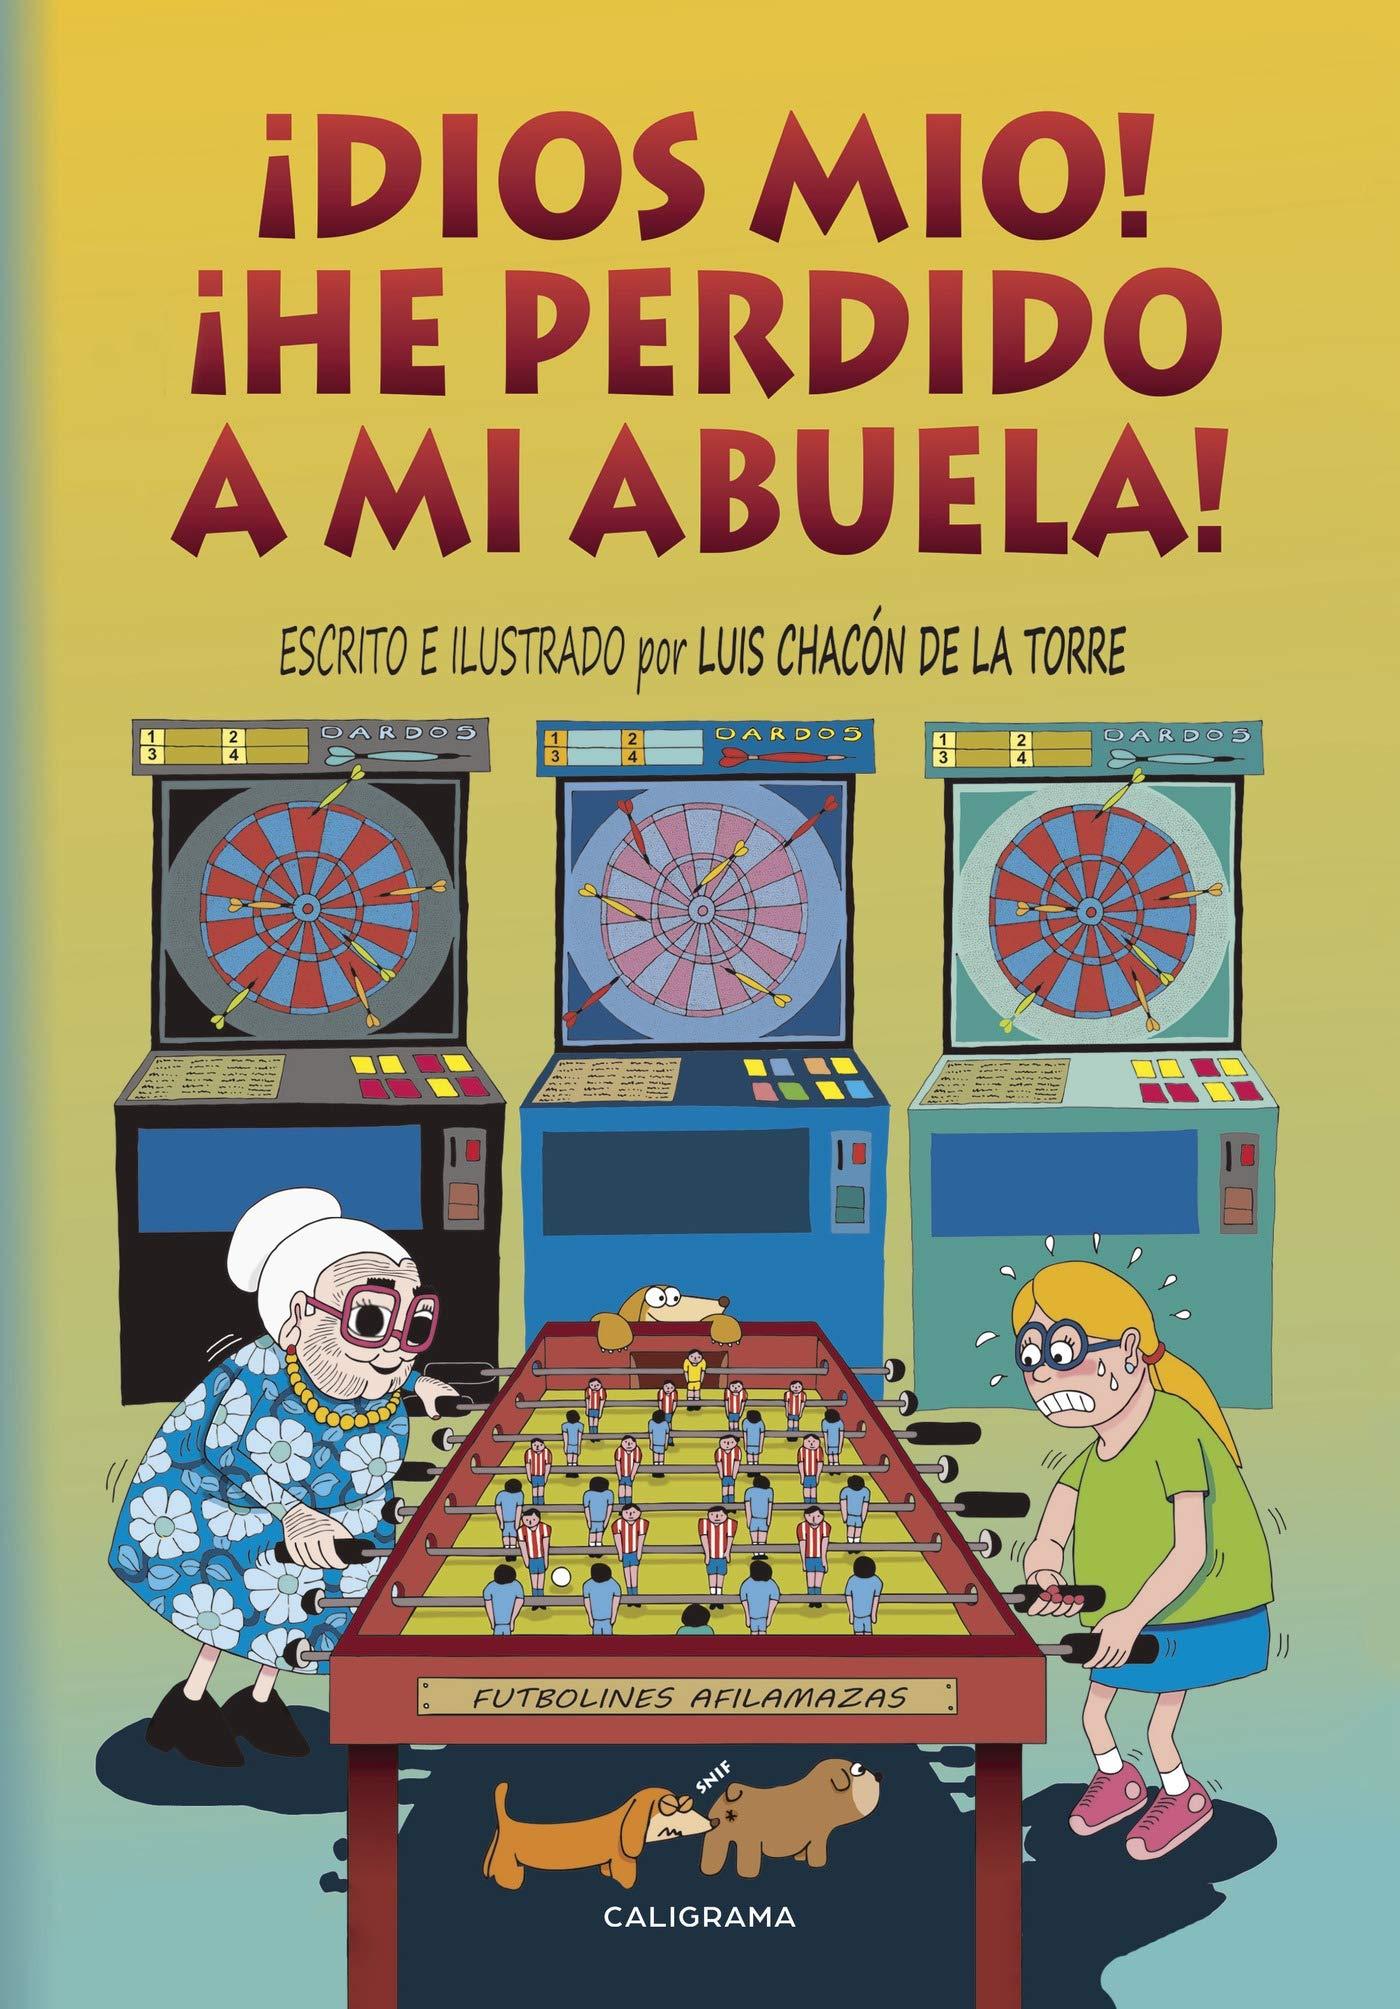 Dios mío! ¡He perdido a mi abuela! (Caligrama): Amazon.es: Chacón, Luis: Libros